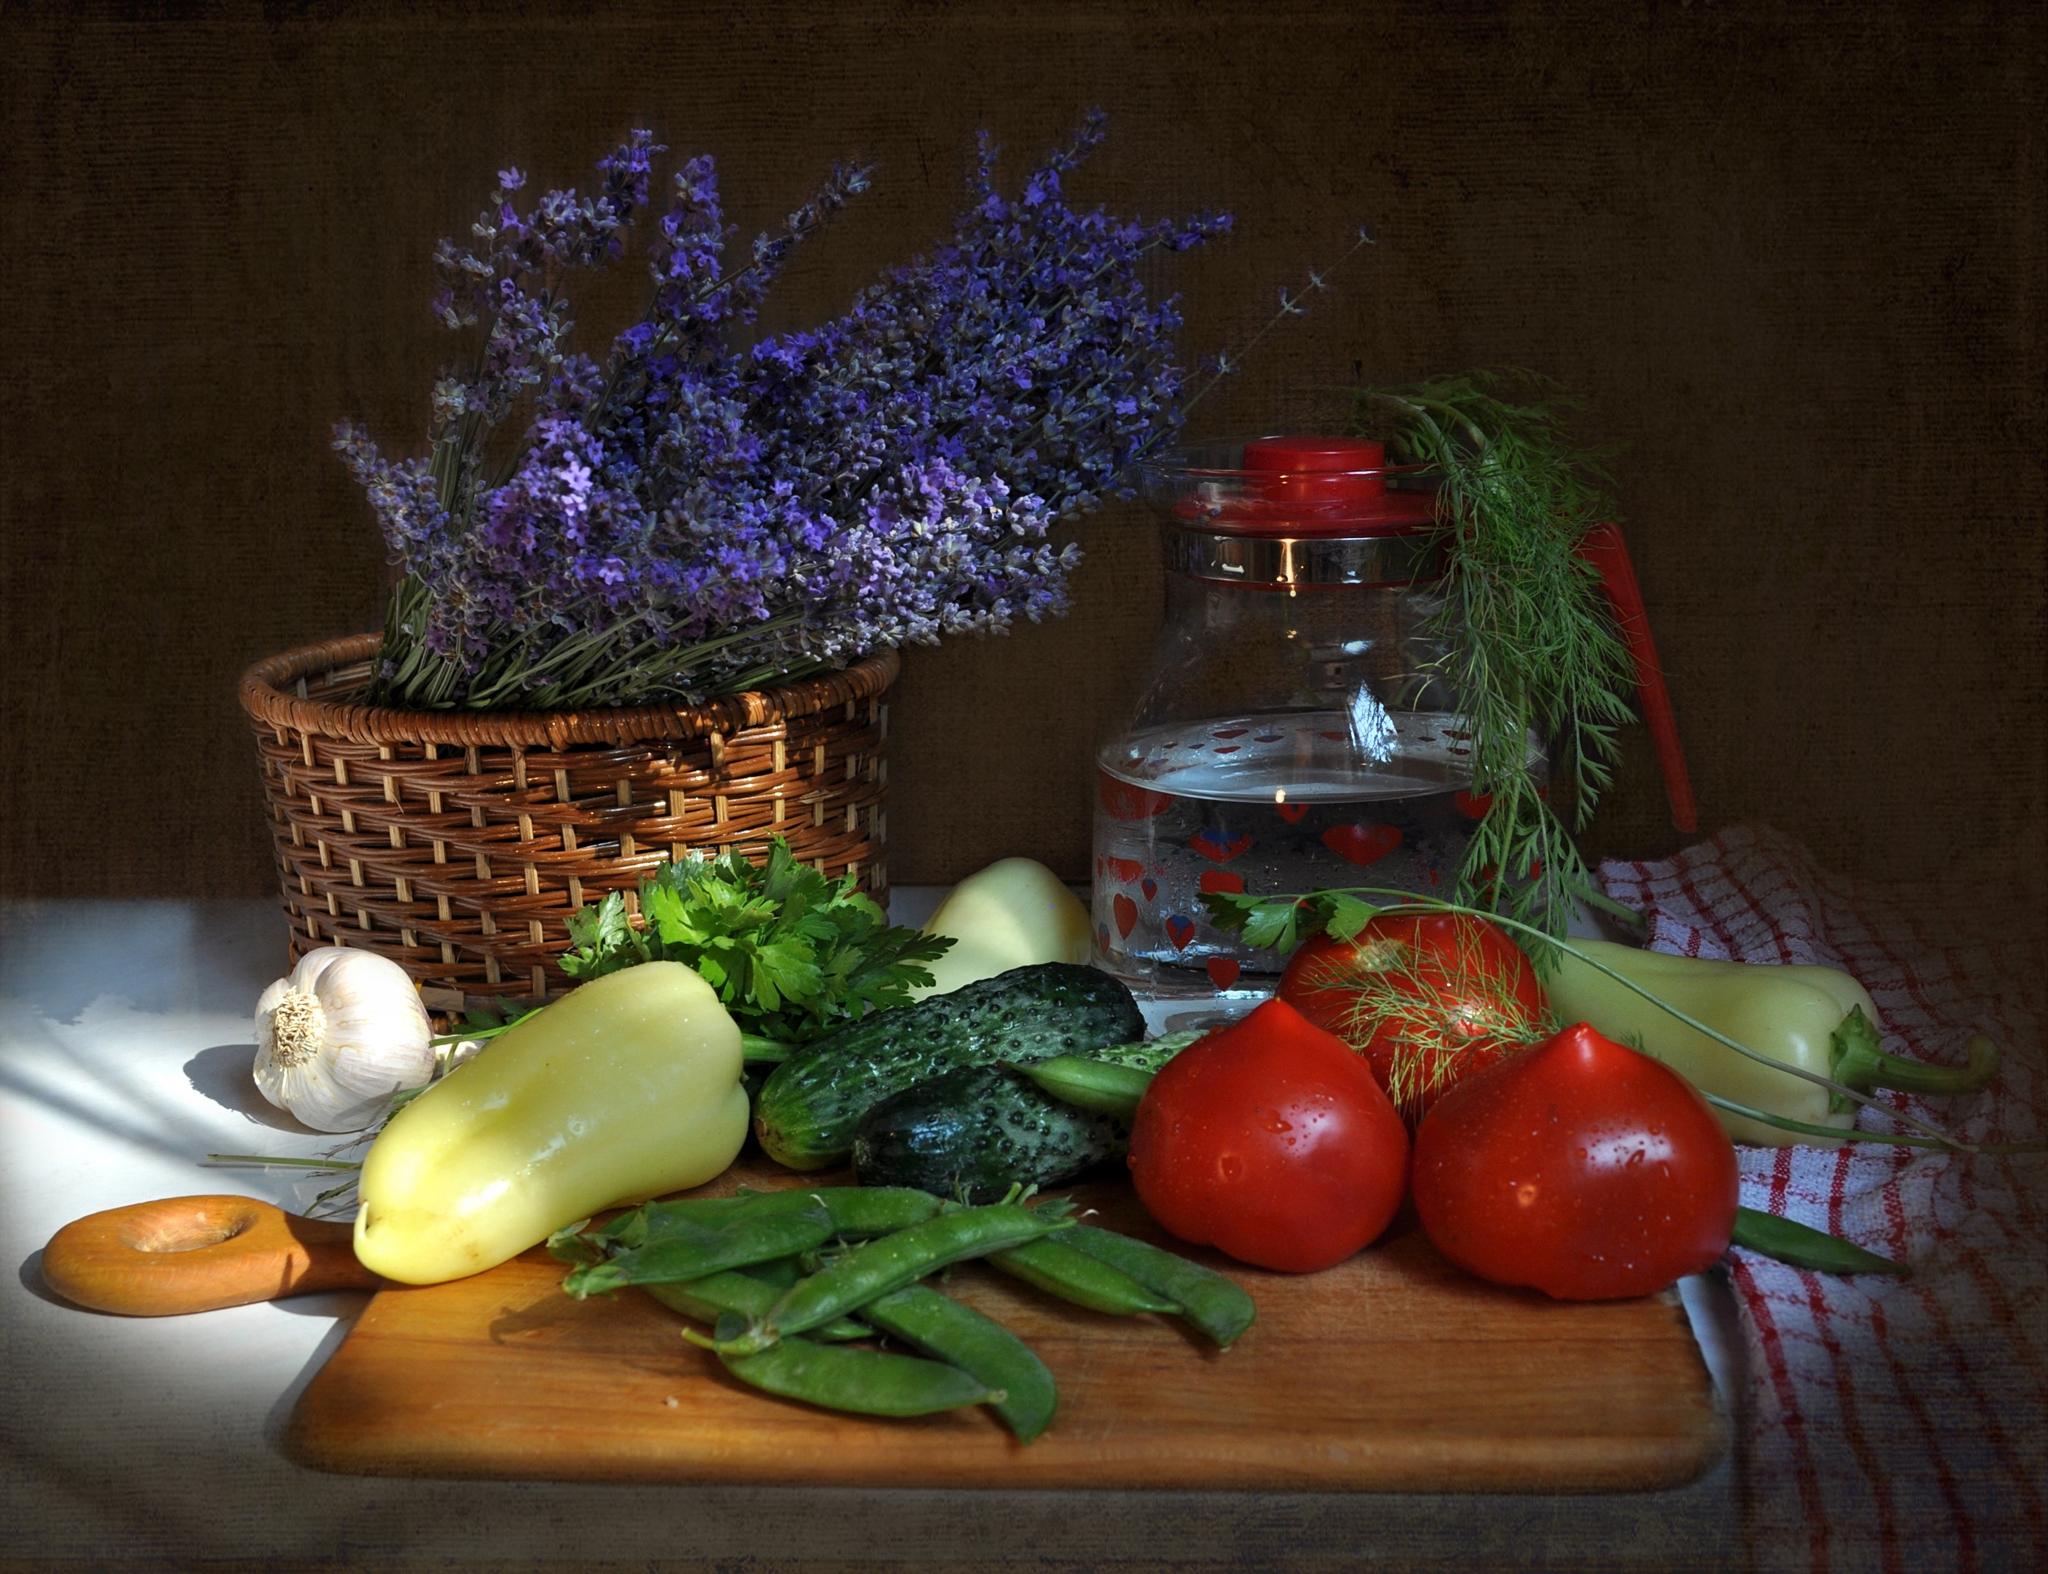 Hintergrundbilder : Malerei, Lebensmittel, Gemüse, Pfeffer, Korb ...